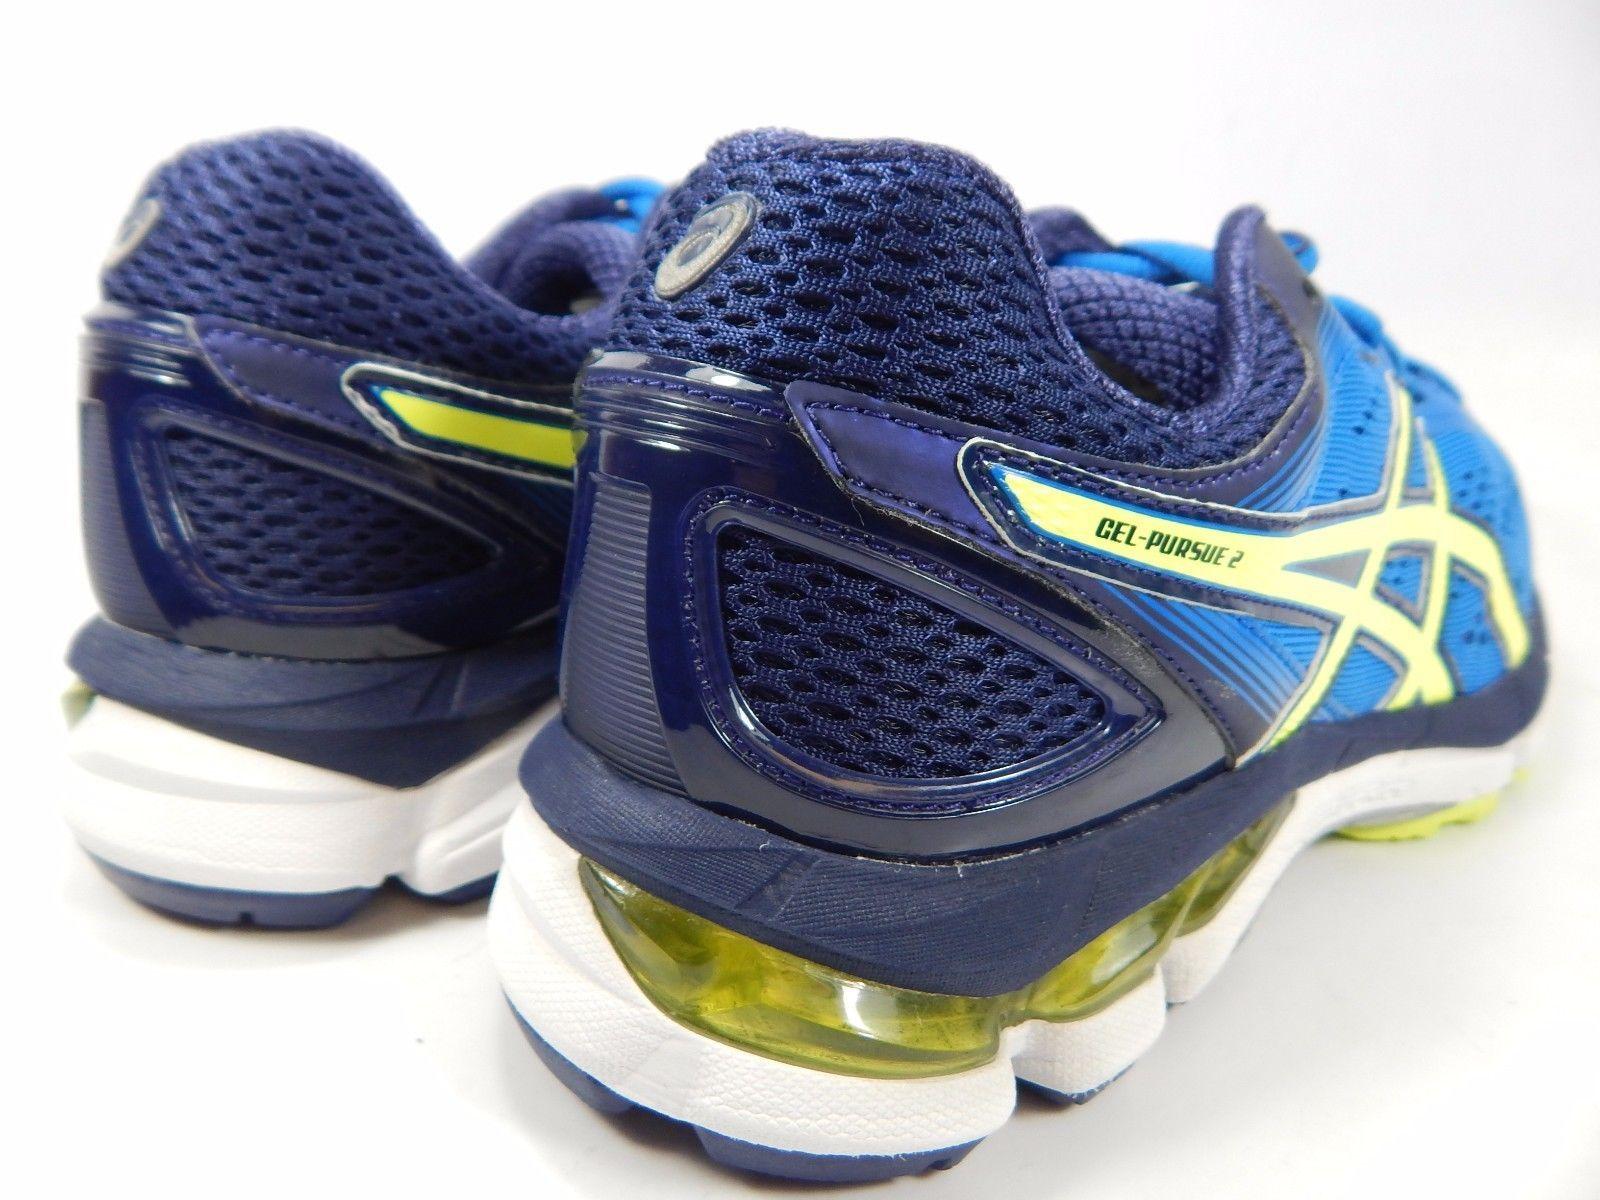 Asics Gel Pursue 2 Men's Running Shoes Size US 7 M (D) EU 40 Blue T5D0N